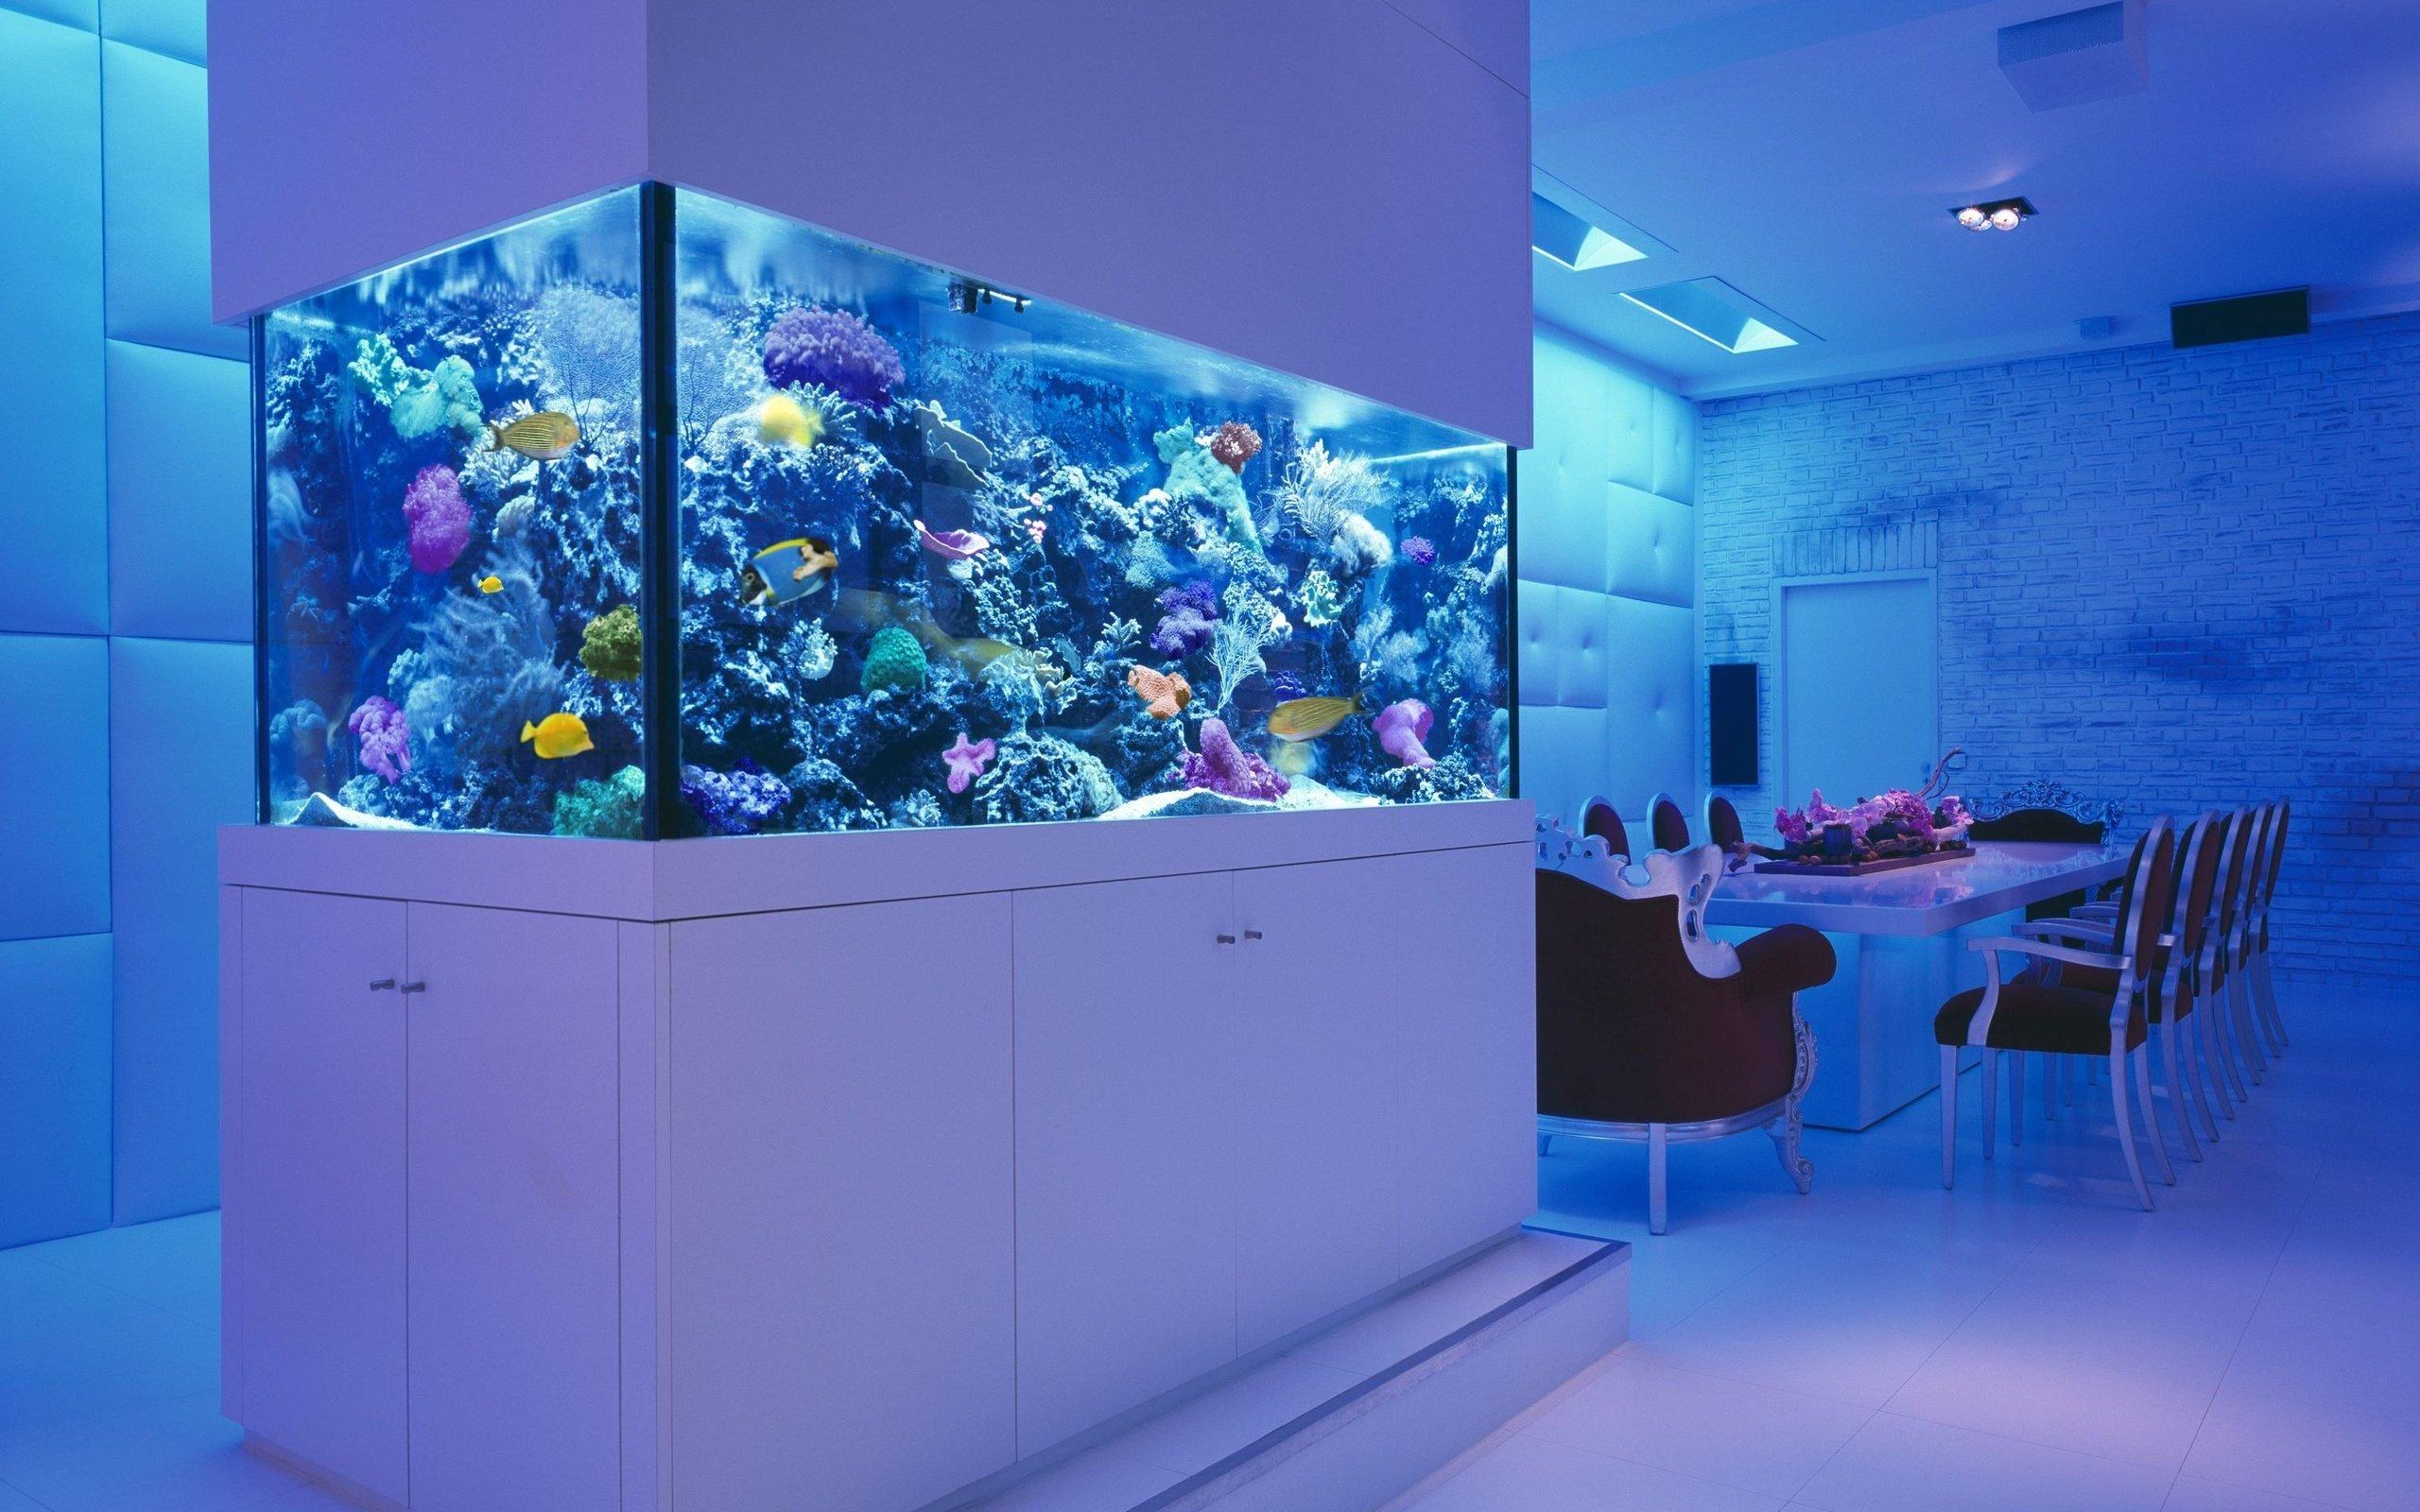 аквариум фото в интерьере фото